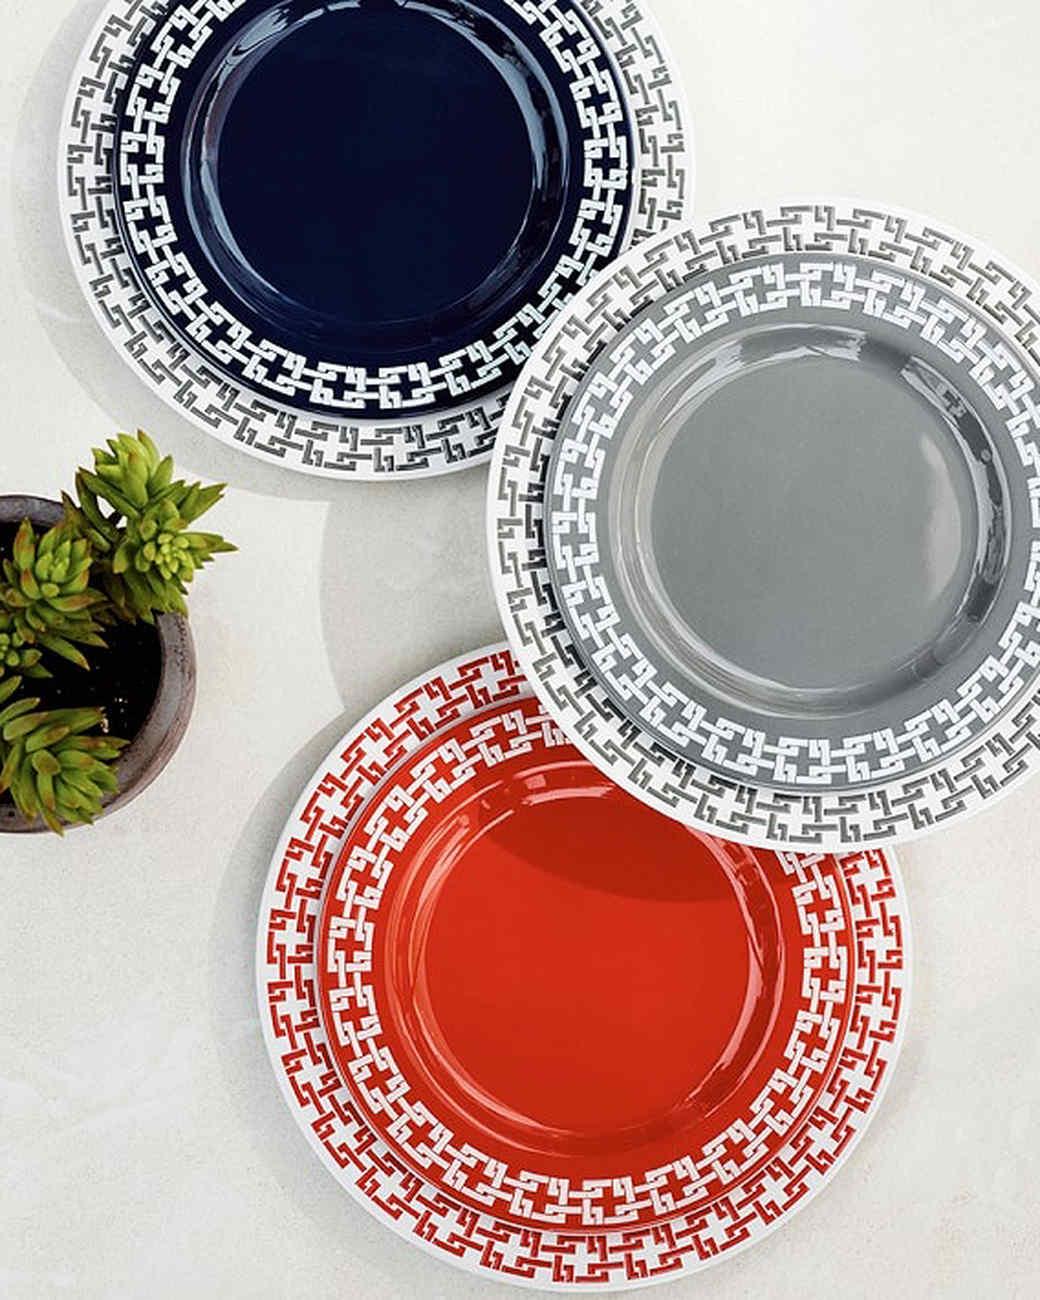 williams-sonoma-dinner-plates.jpg